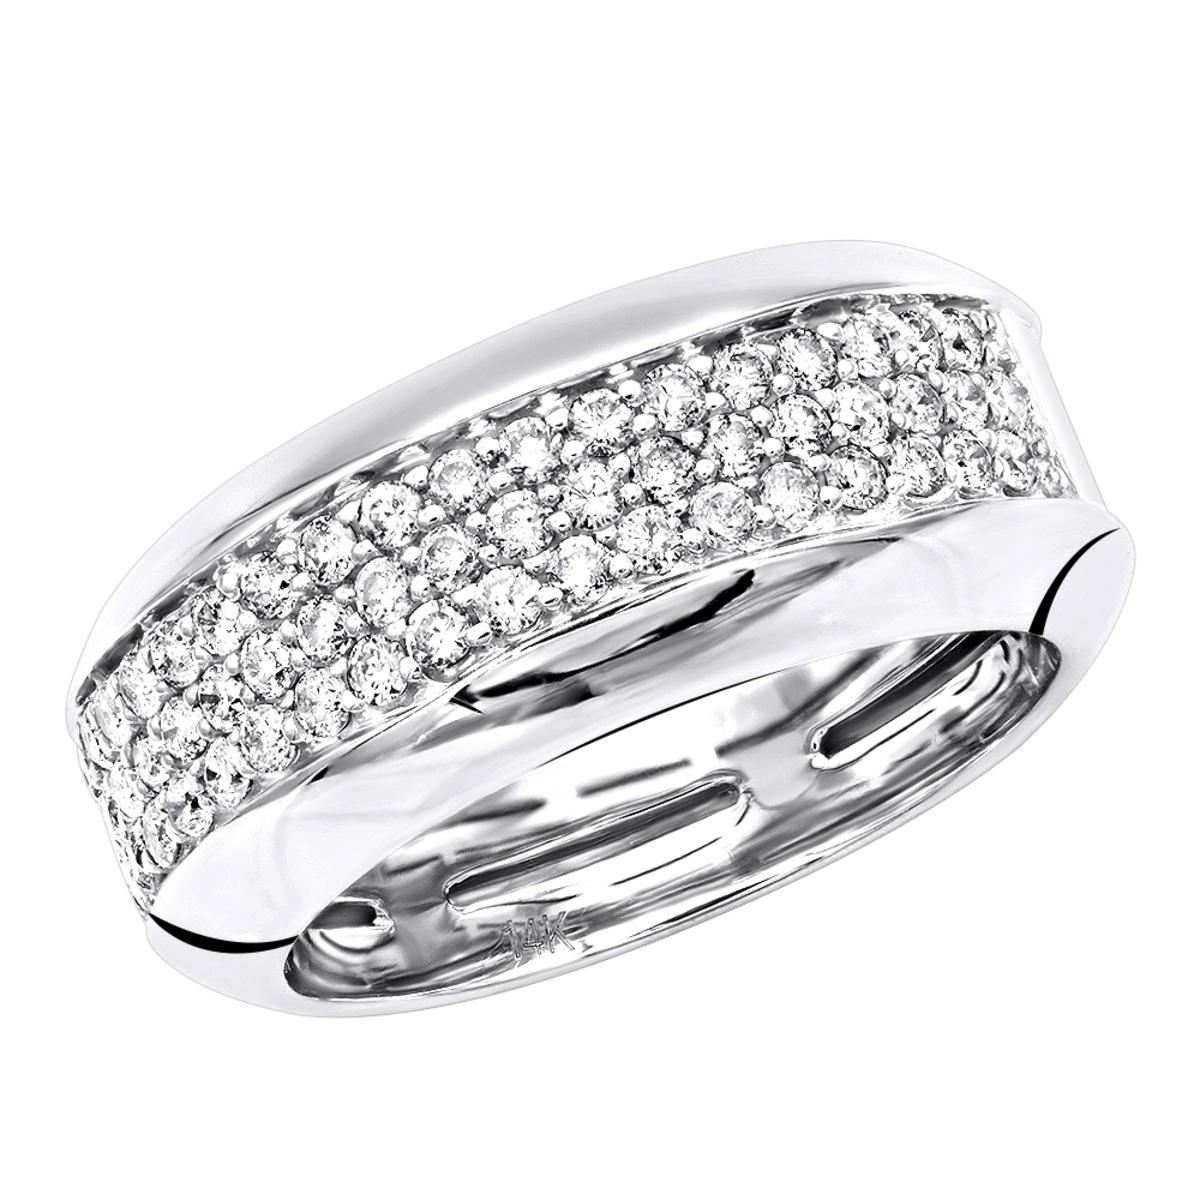 Wide 14k Gold Diamond Wedding Band For Women Anniversary Ring 0.8ct